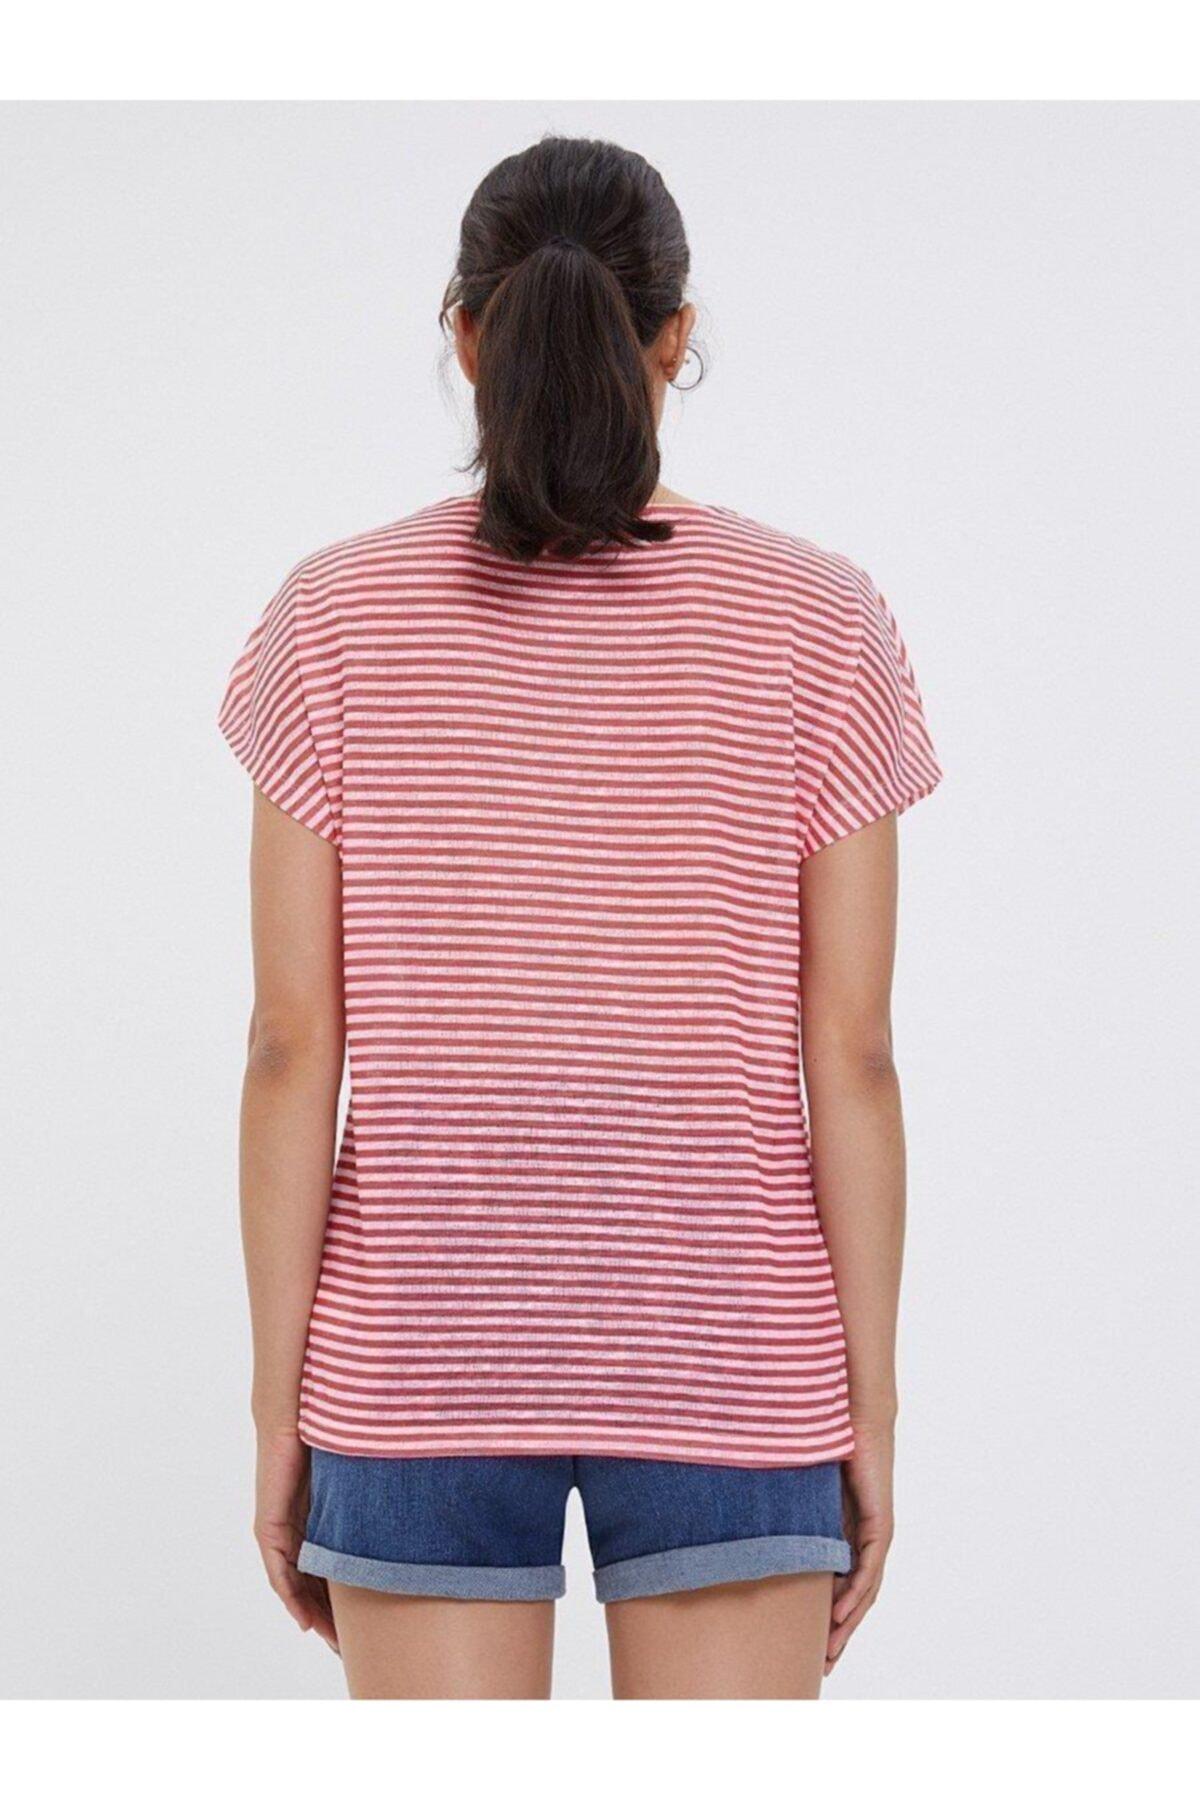 Loft Regular Fit Kadın Tshirt Kısa Kol T-shırt 2